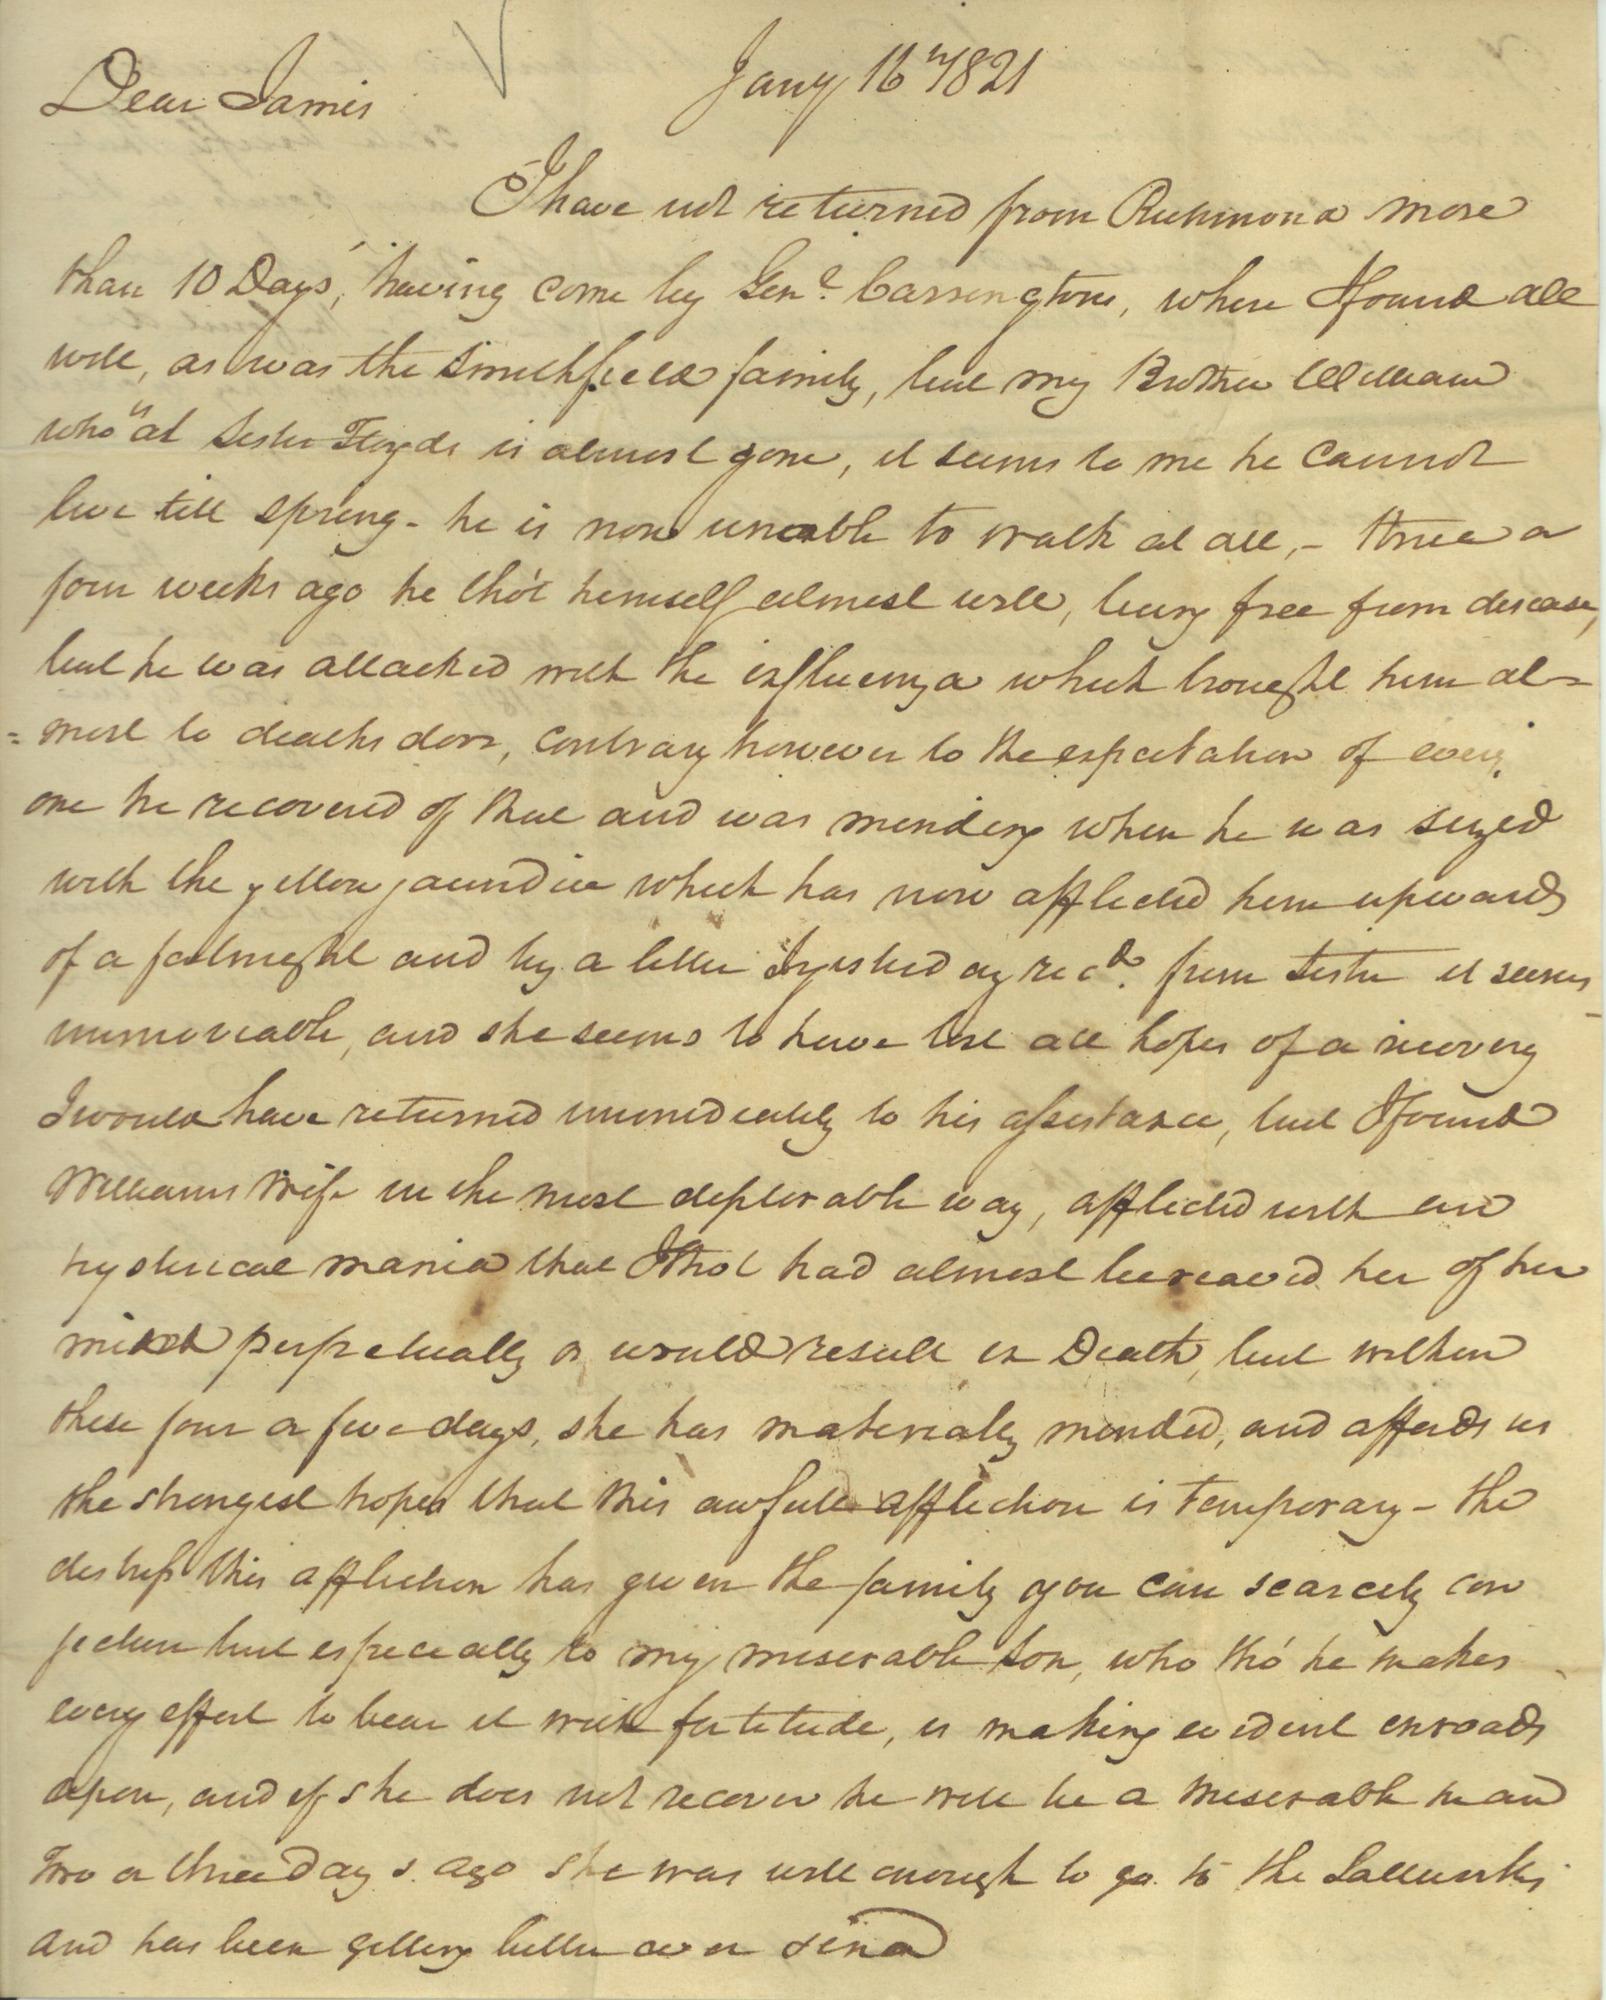 Ms1997_002_SmithfieldPreston_Letter_1821_0116a.jpg